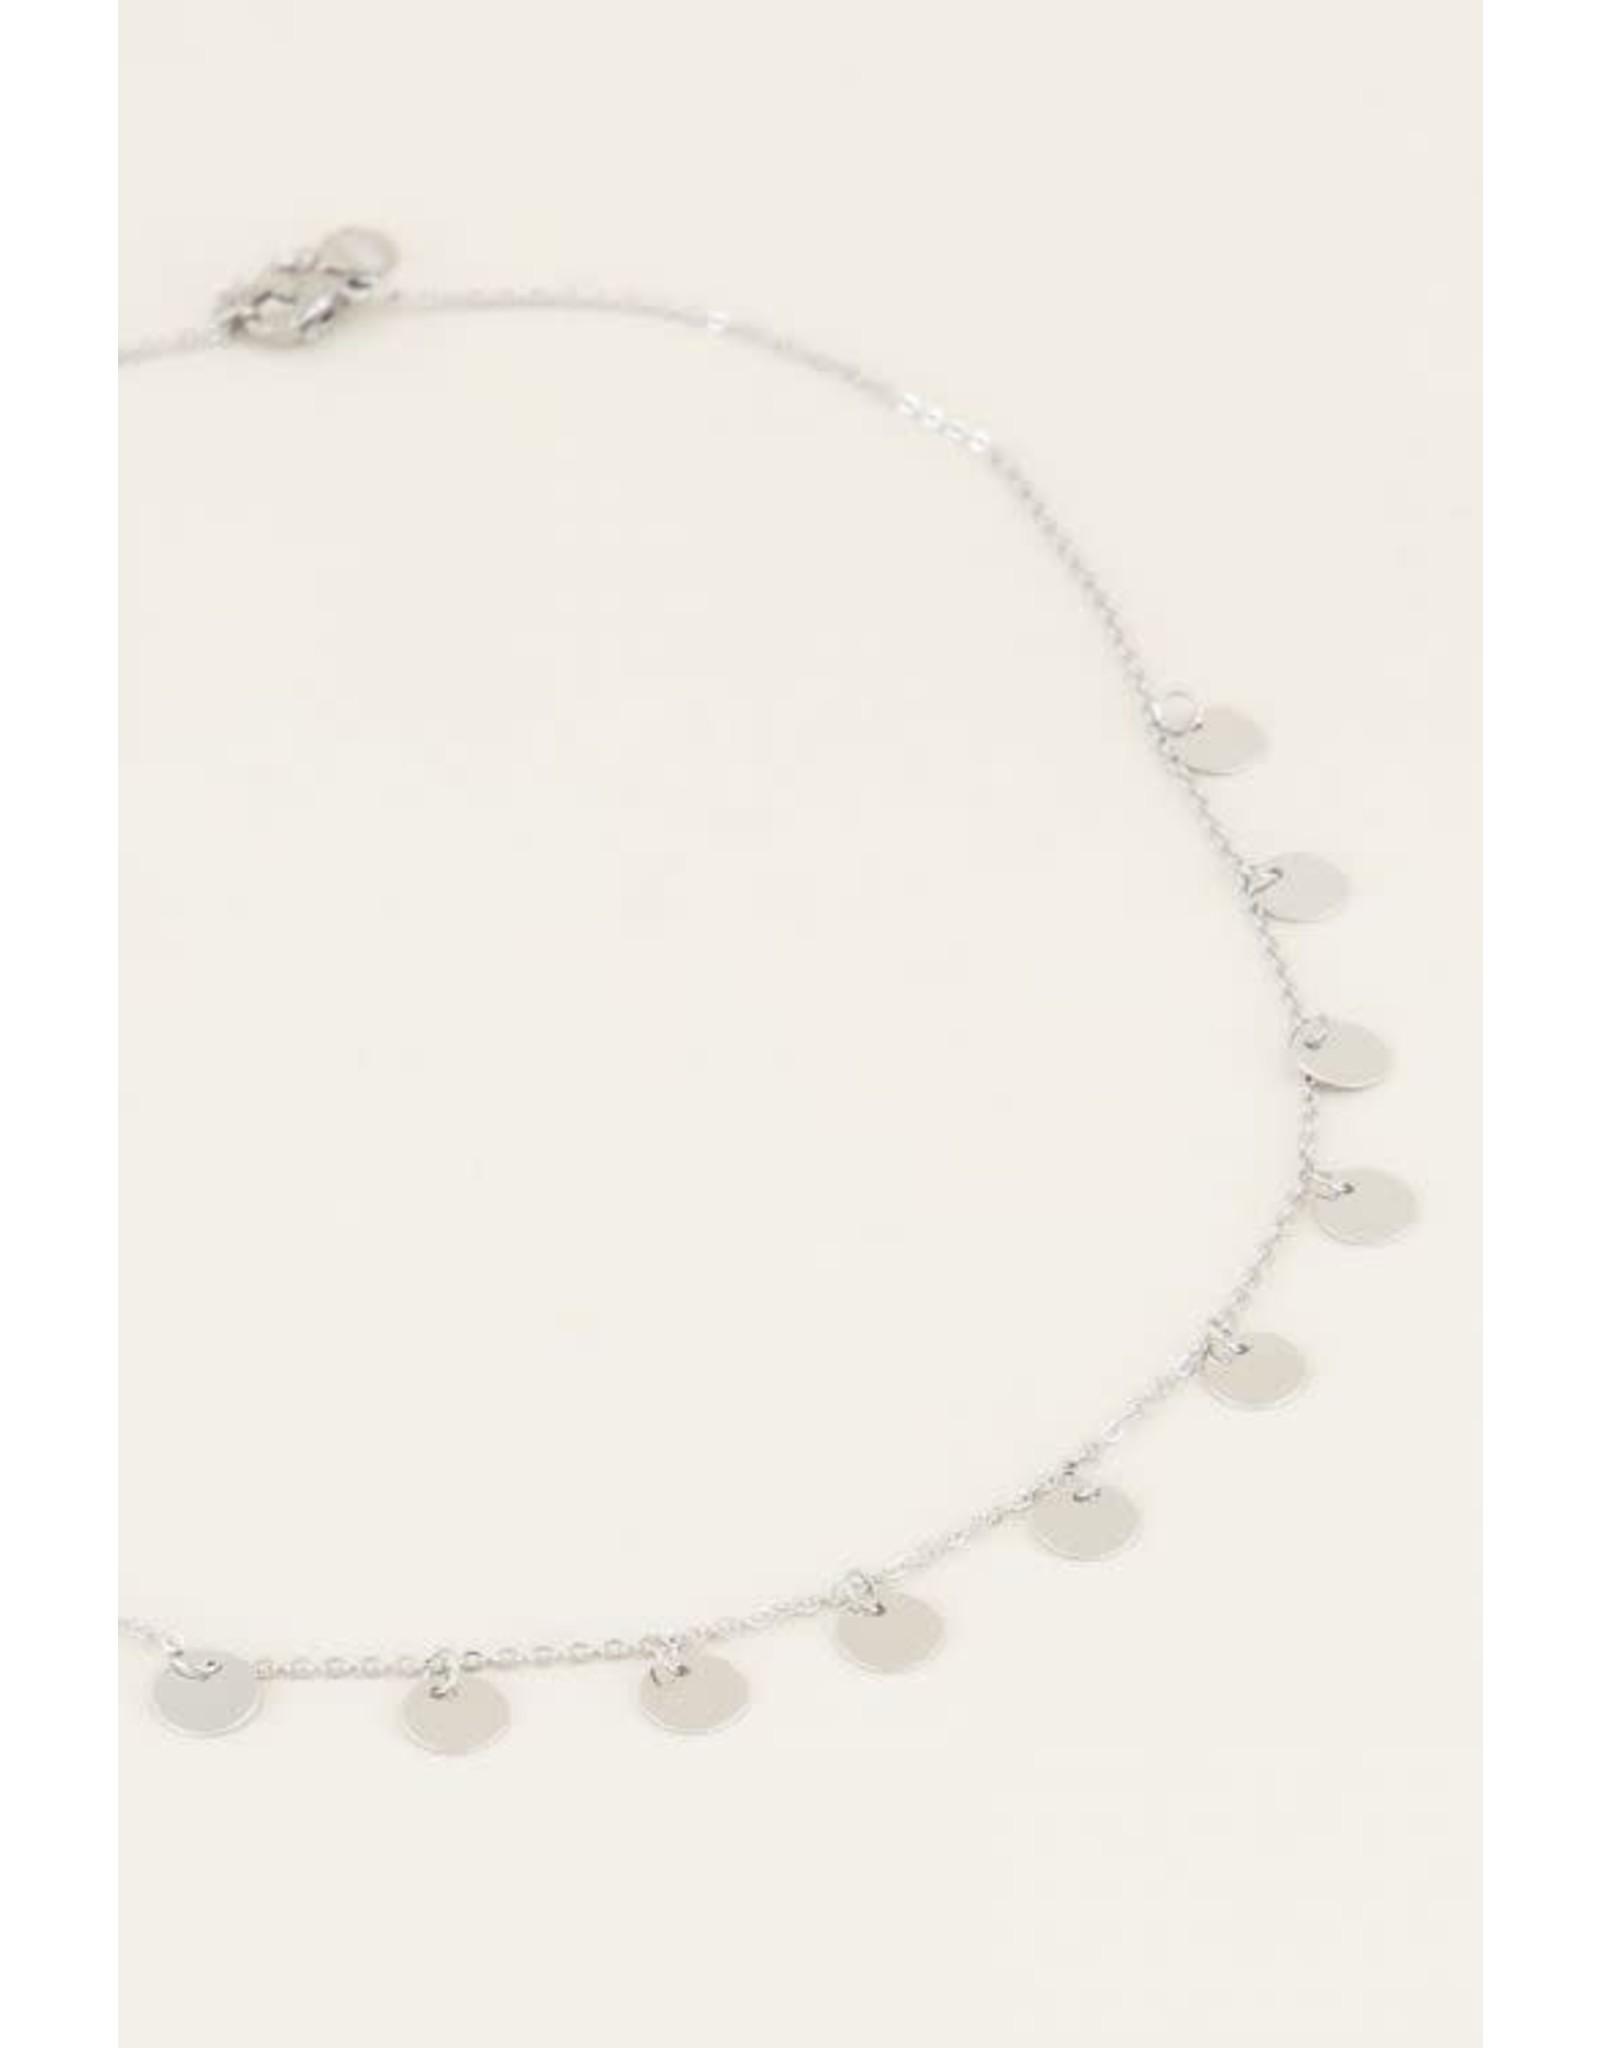 My Jewellery My Jewellery ketting muntjes